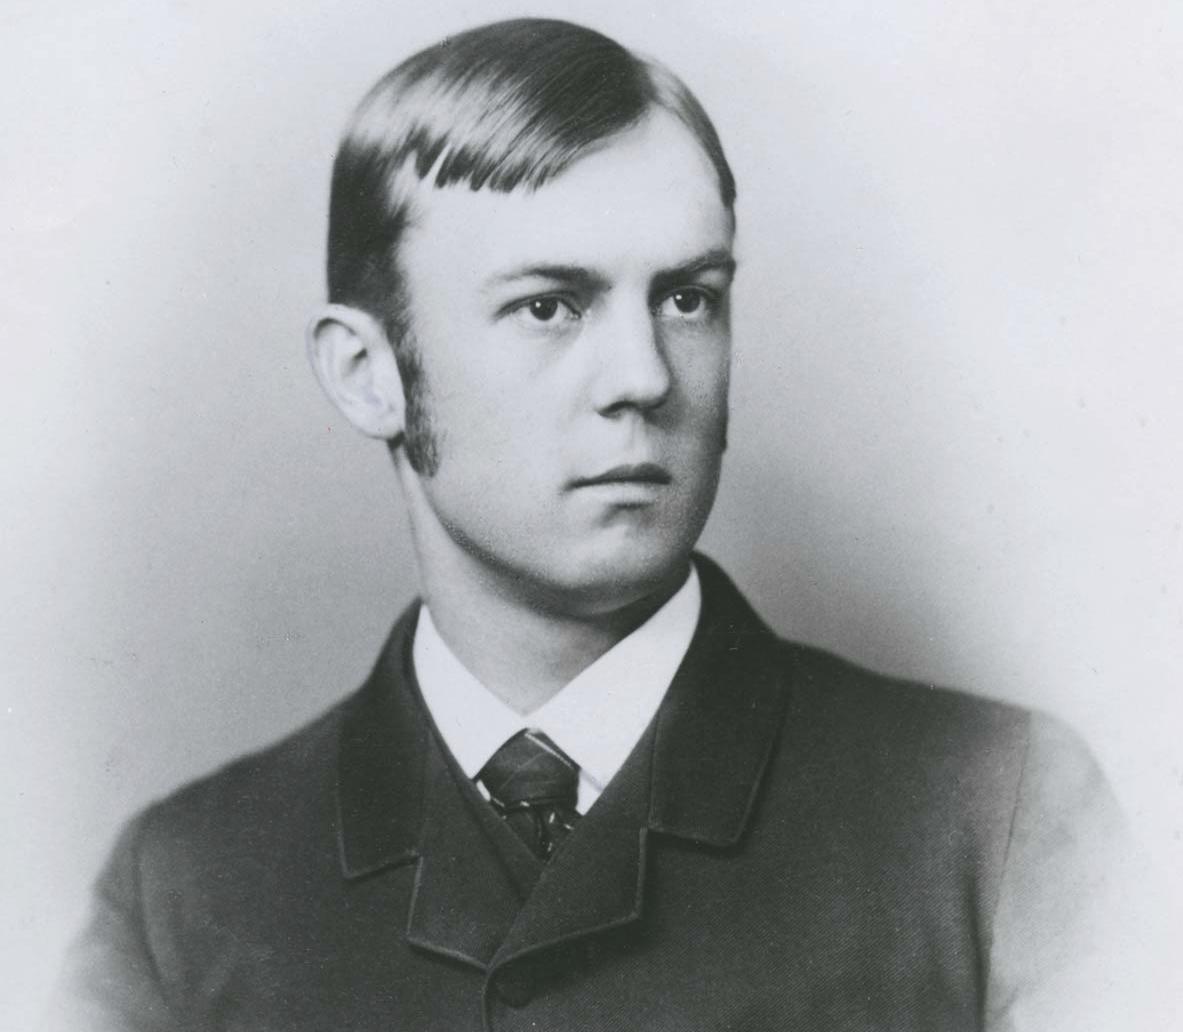 Charles Horton Cooley